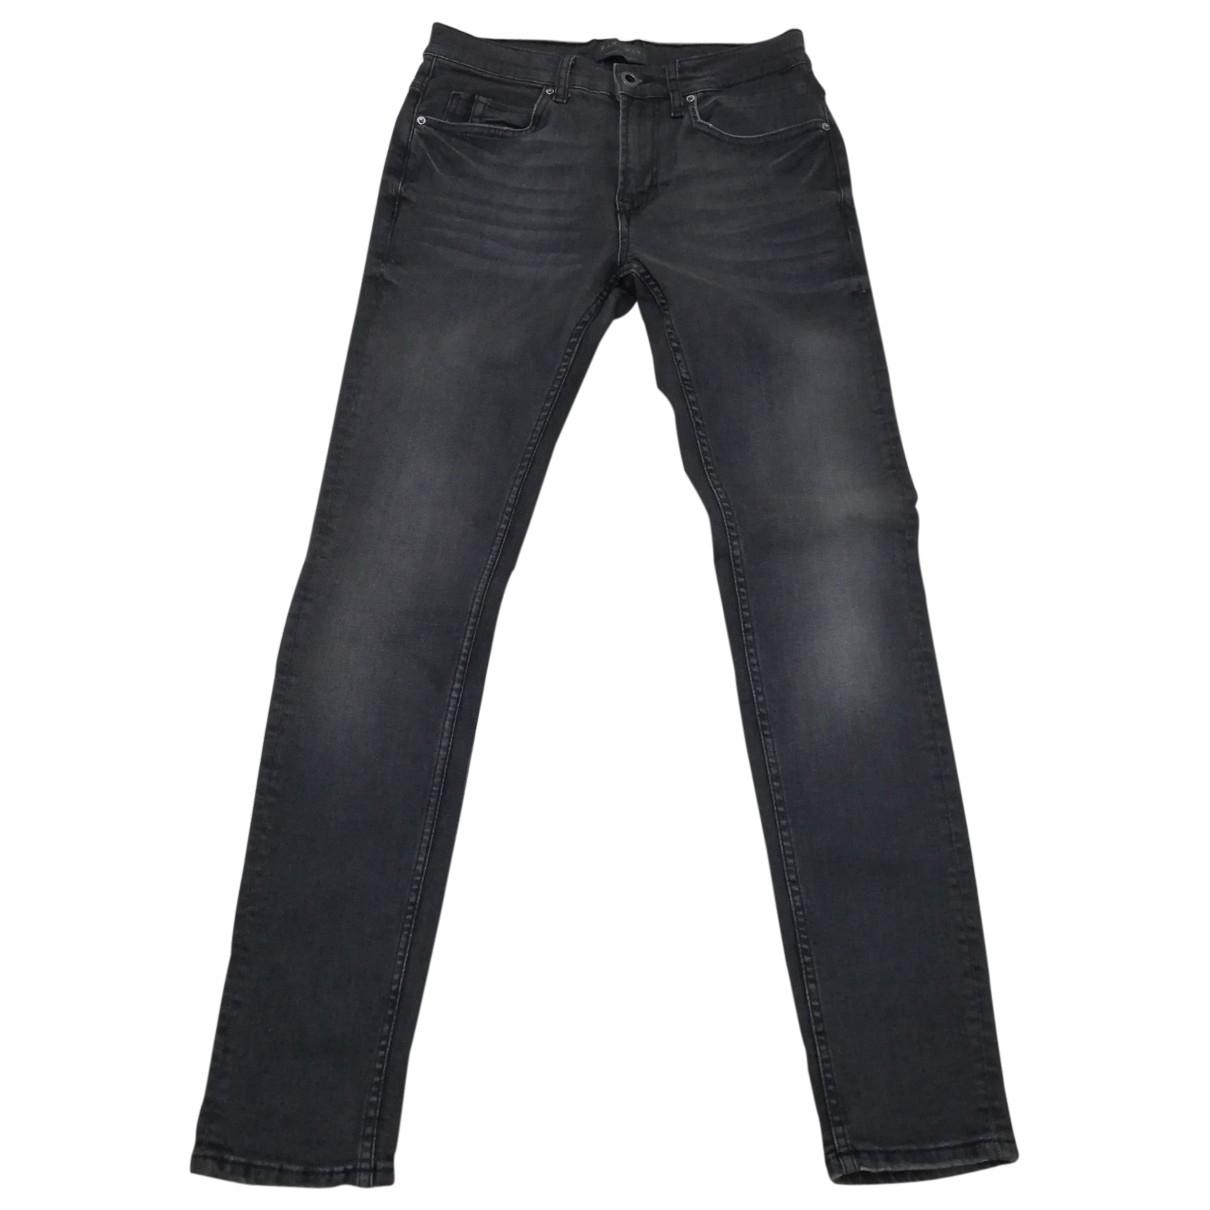 Zara \N Black Cotton Jeans for Men 29 US